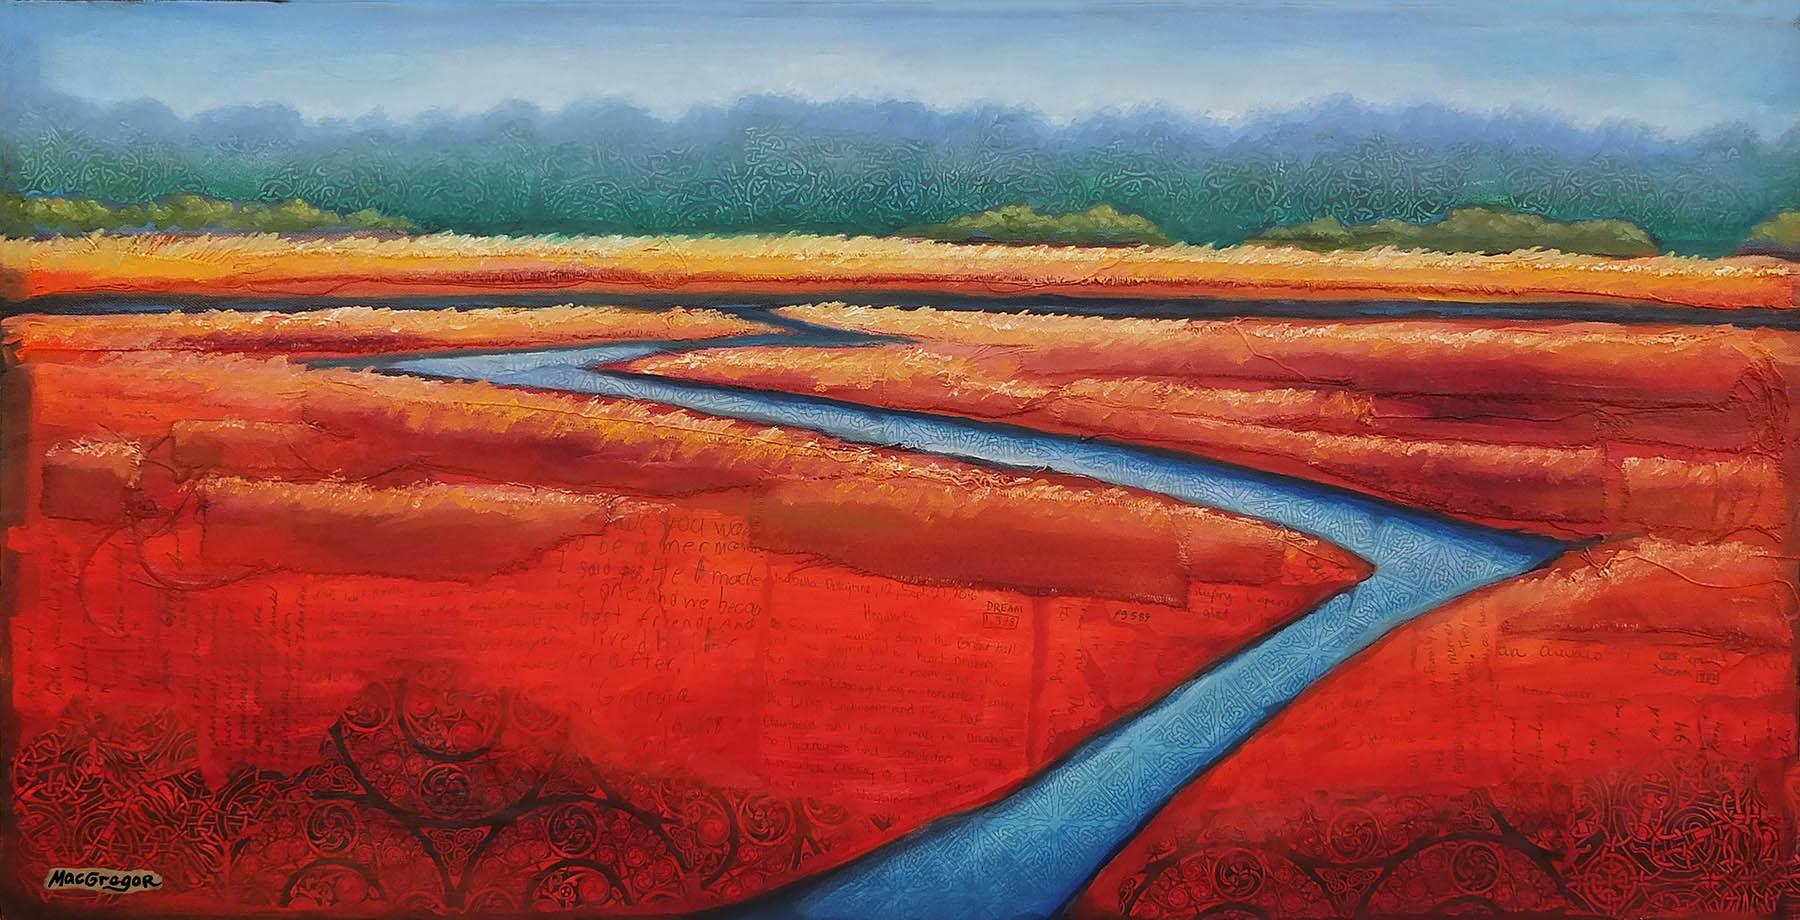 Georgia Original painting of marsh a marsh in Savannah Savannah painting. Marsh View from the Pool: Original 7x10in watercolor painting